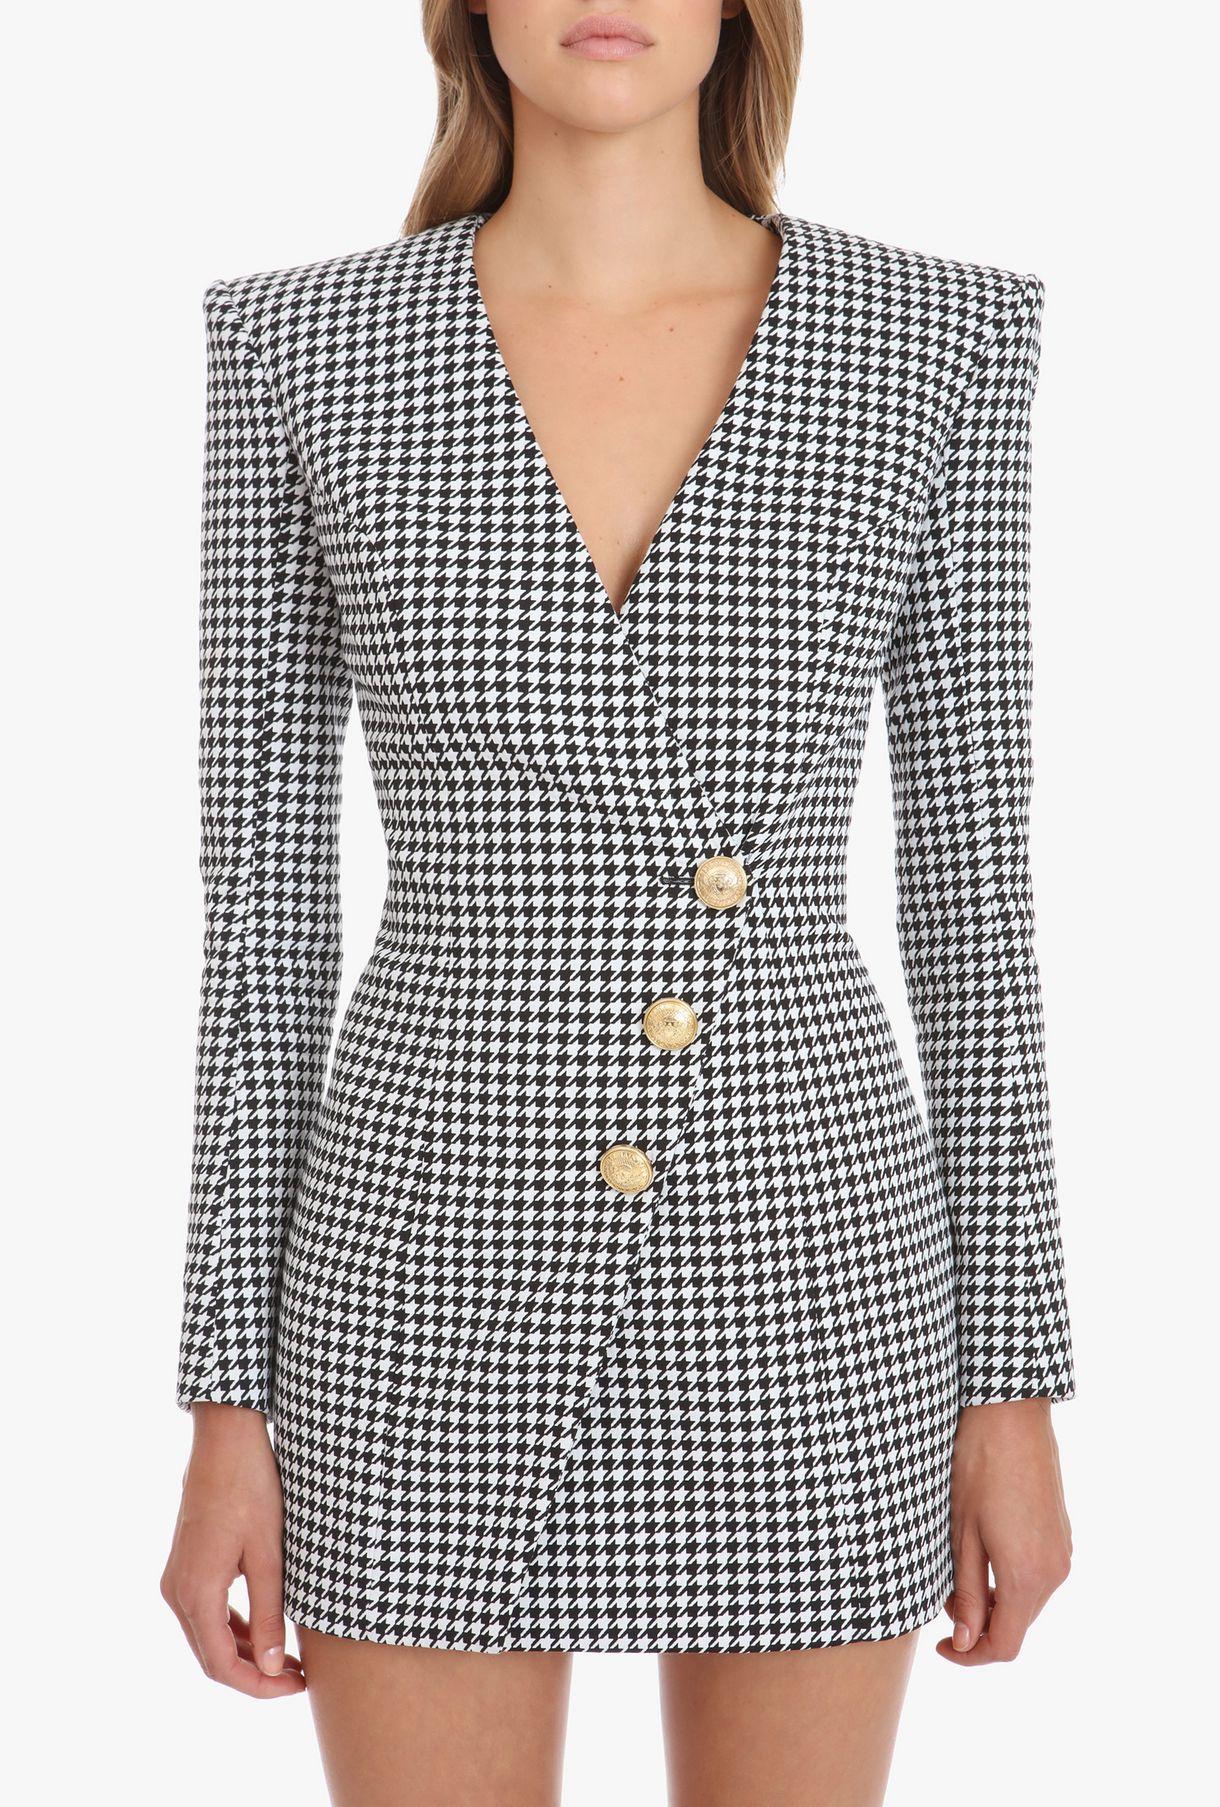 d7e4e605 Balmain - Black & white cache-cœur cotton mini dress | DRESSES in ...